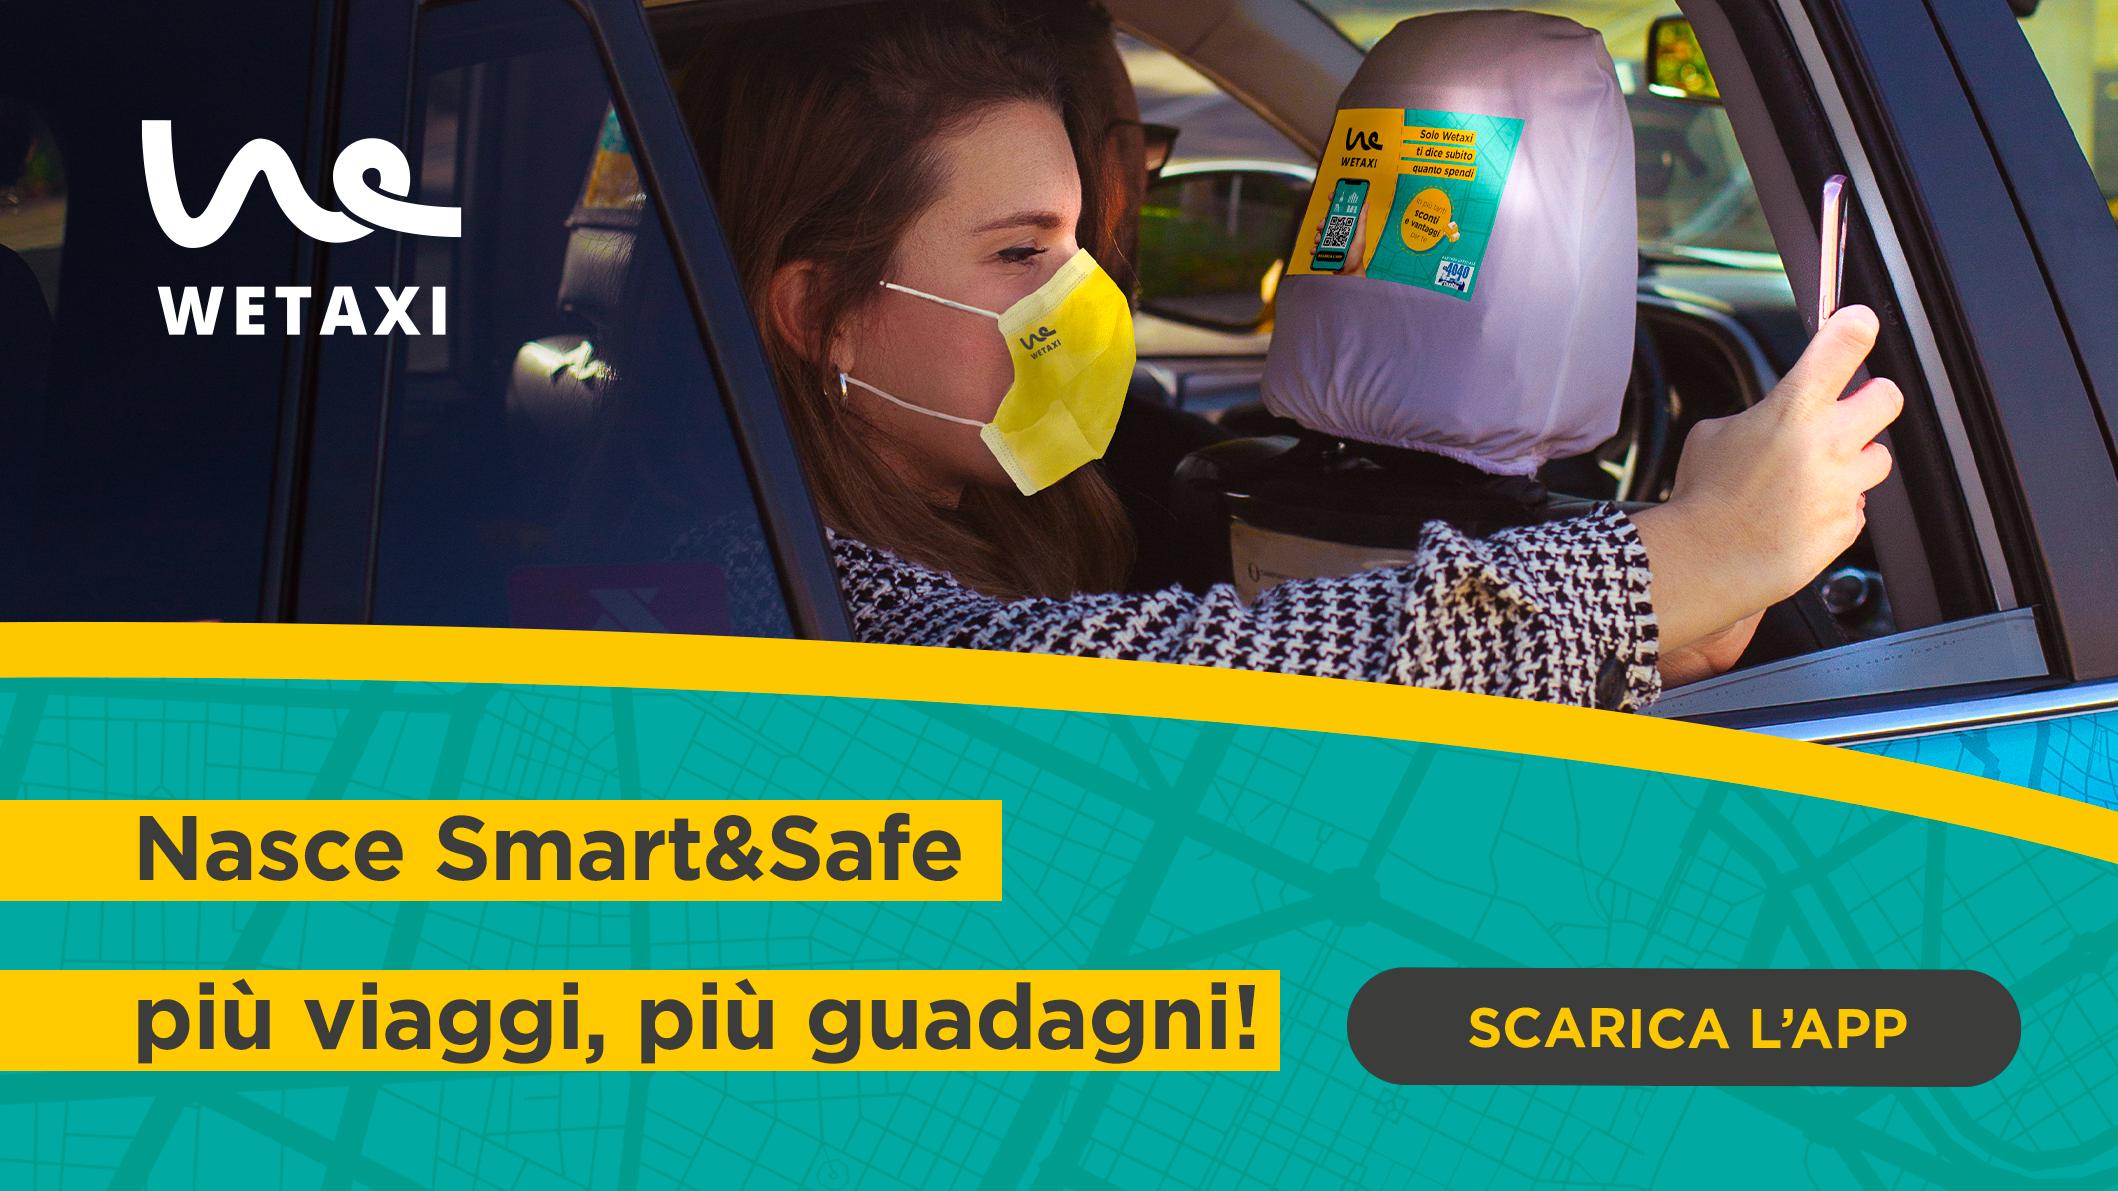 Il programma Smart&Safe